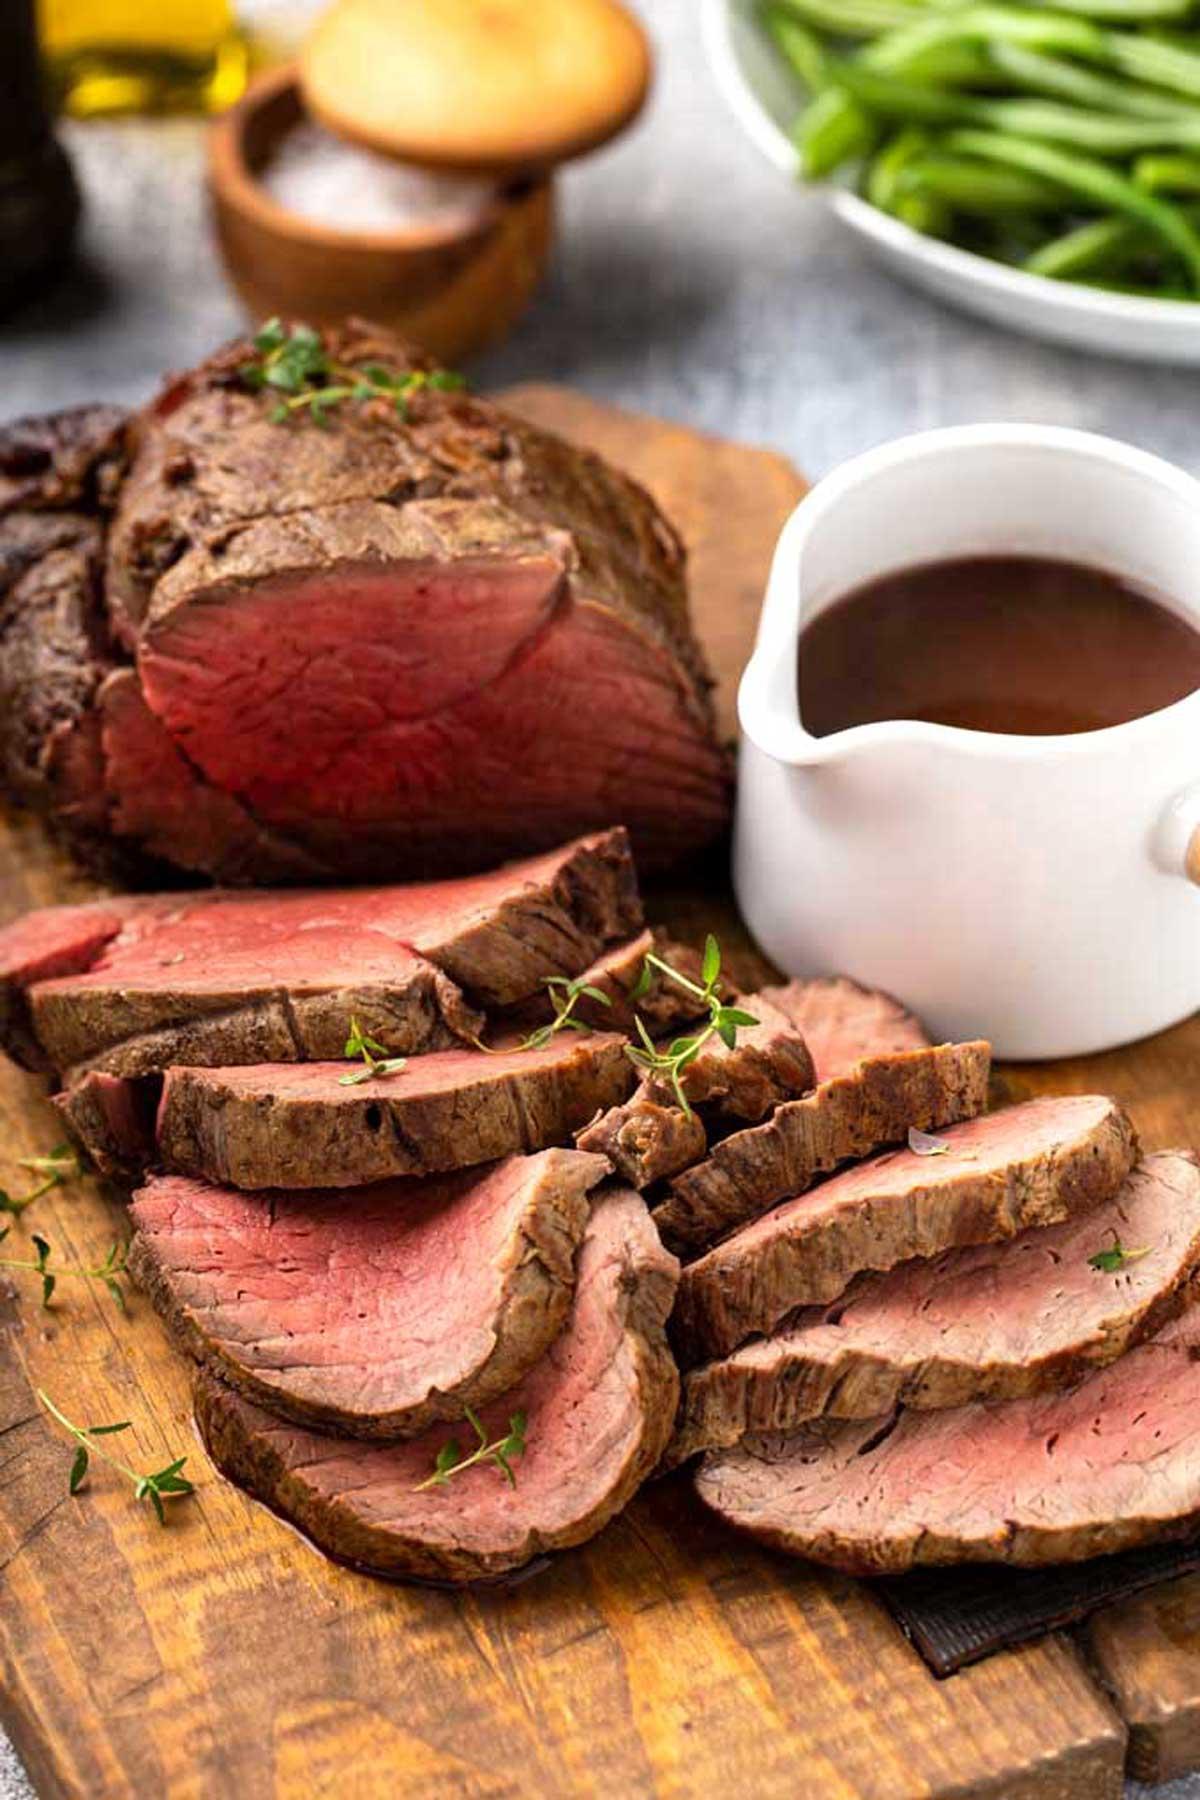 A beef tenderloin roast sliced on a carving board.